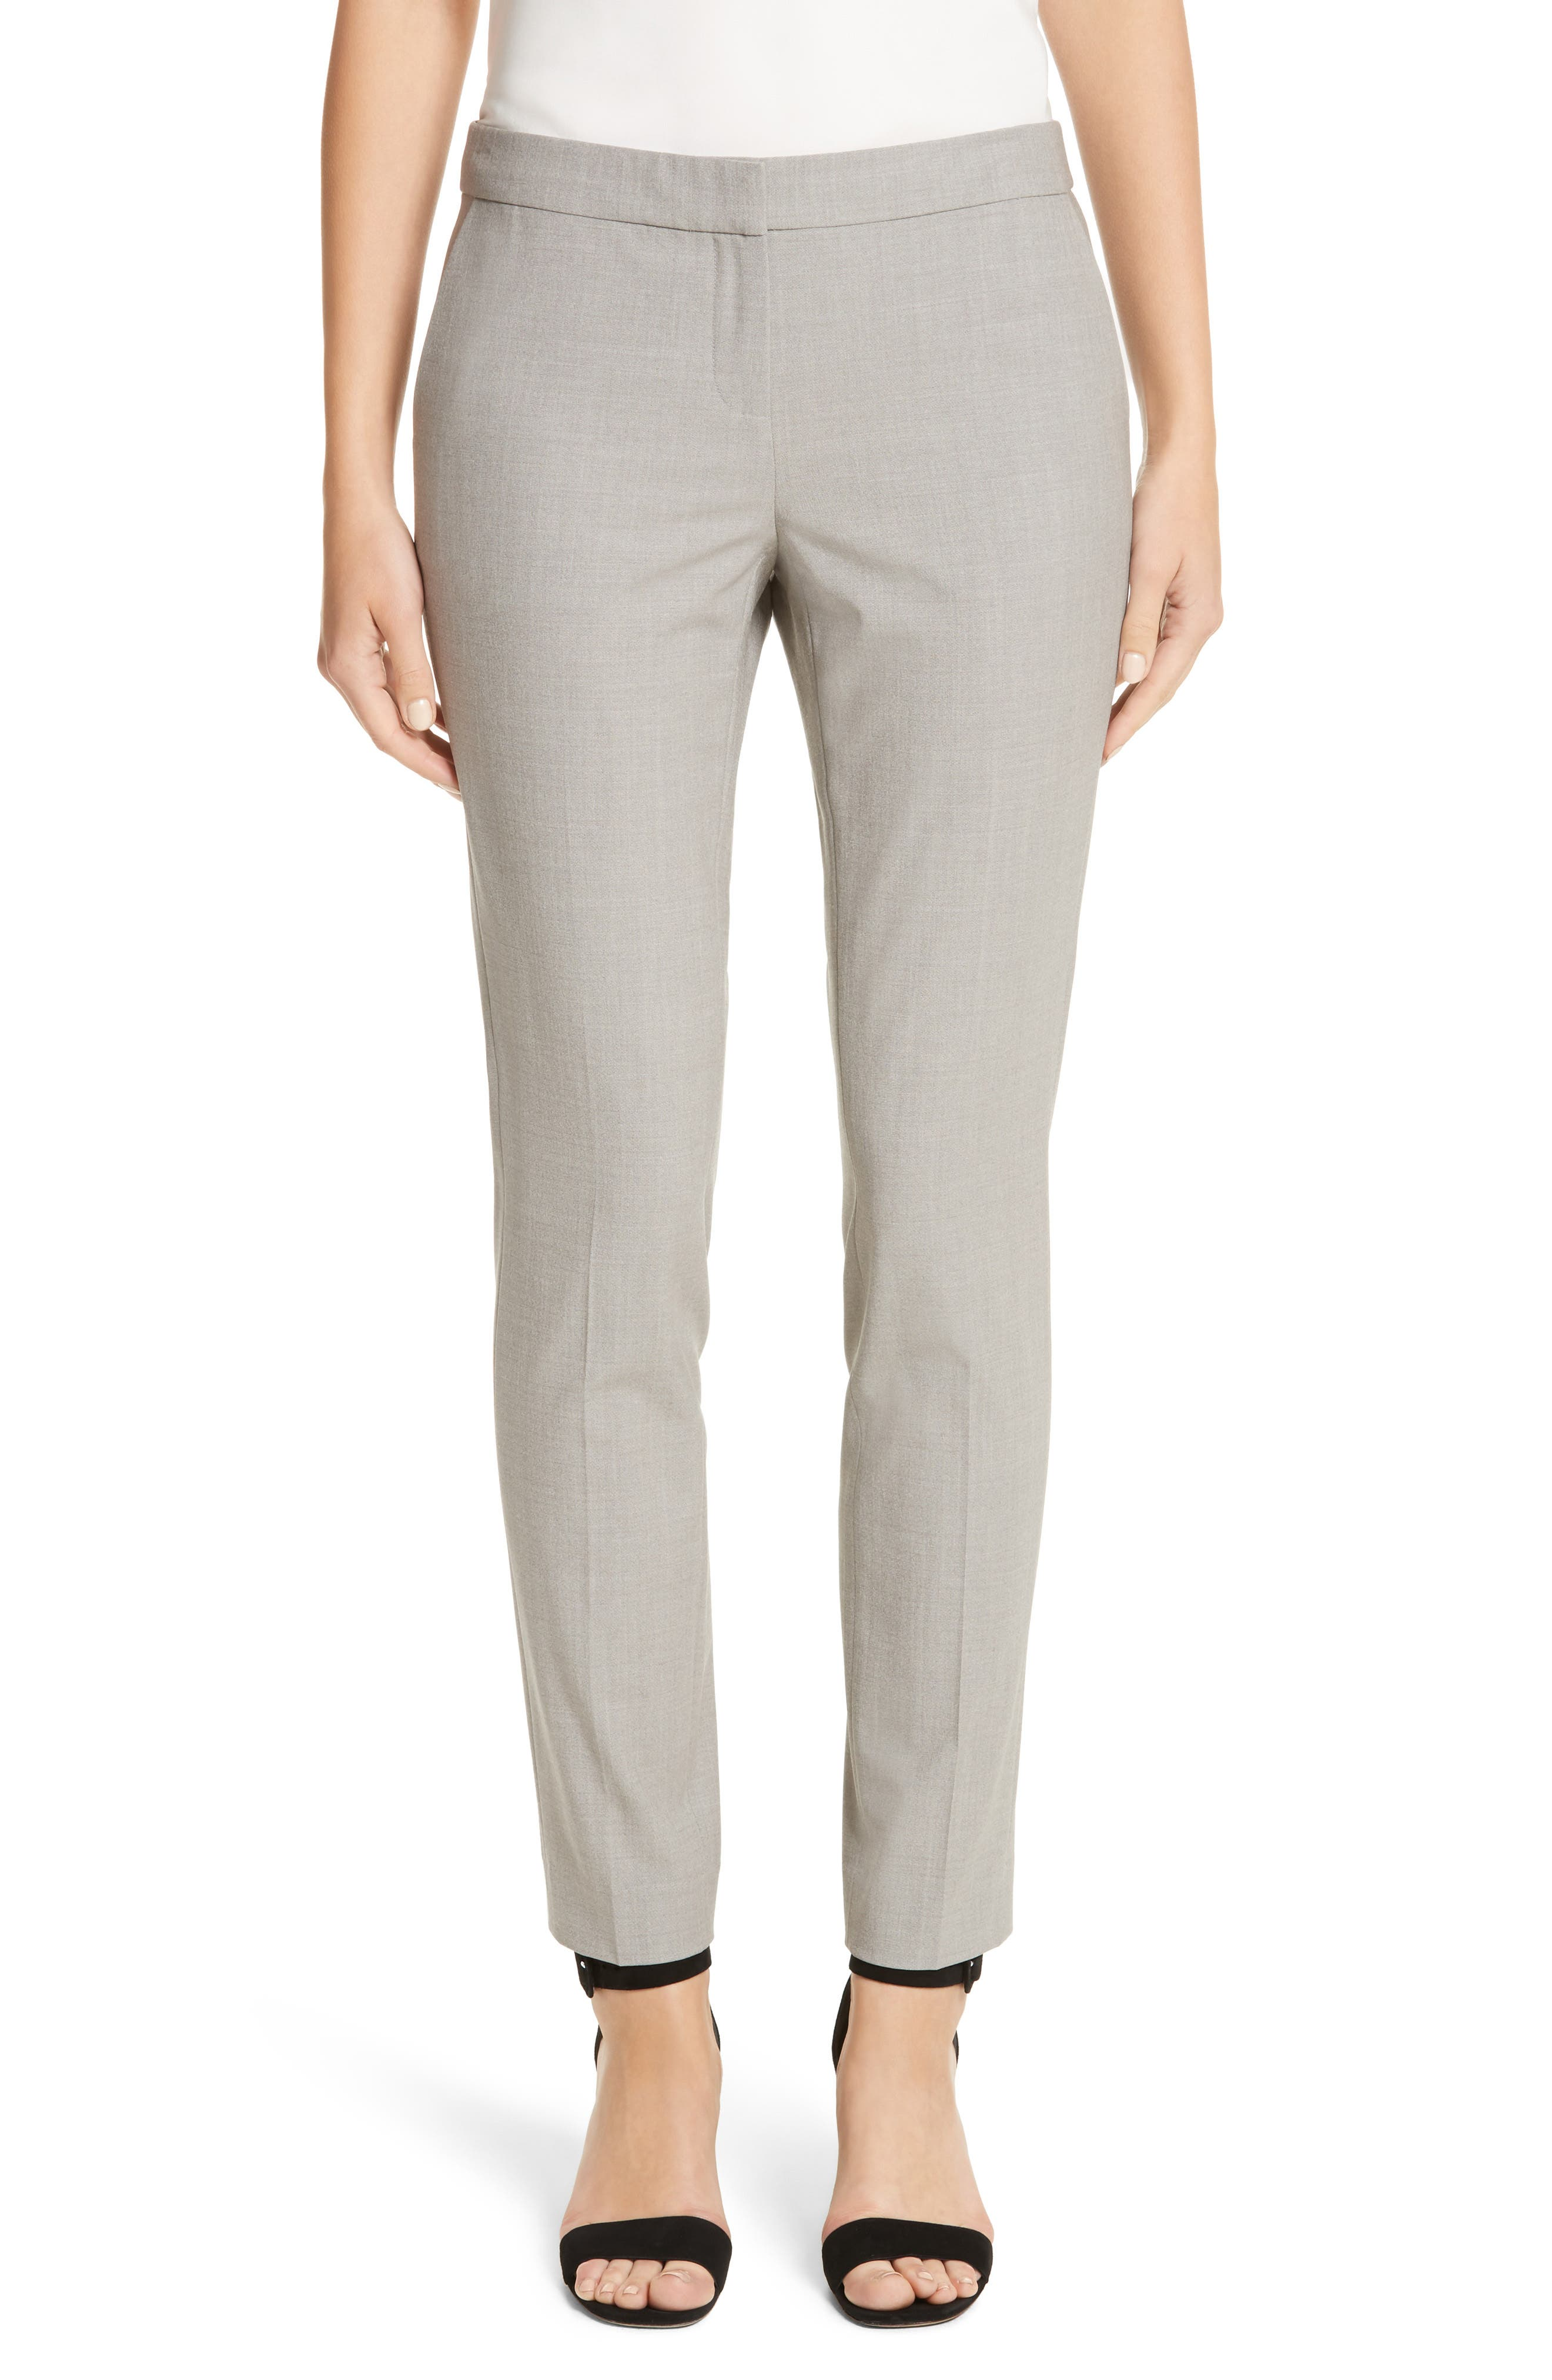 Manhattan Slim Pants,                         Main,                         color, Feather Grey Melange